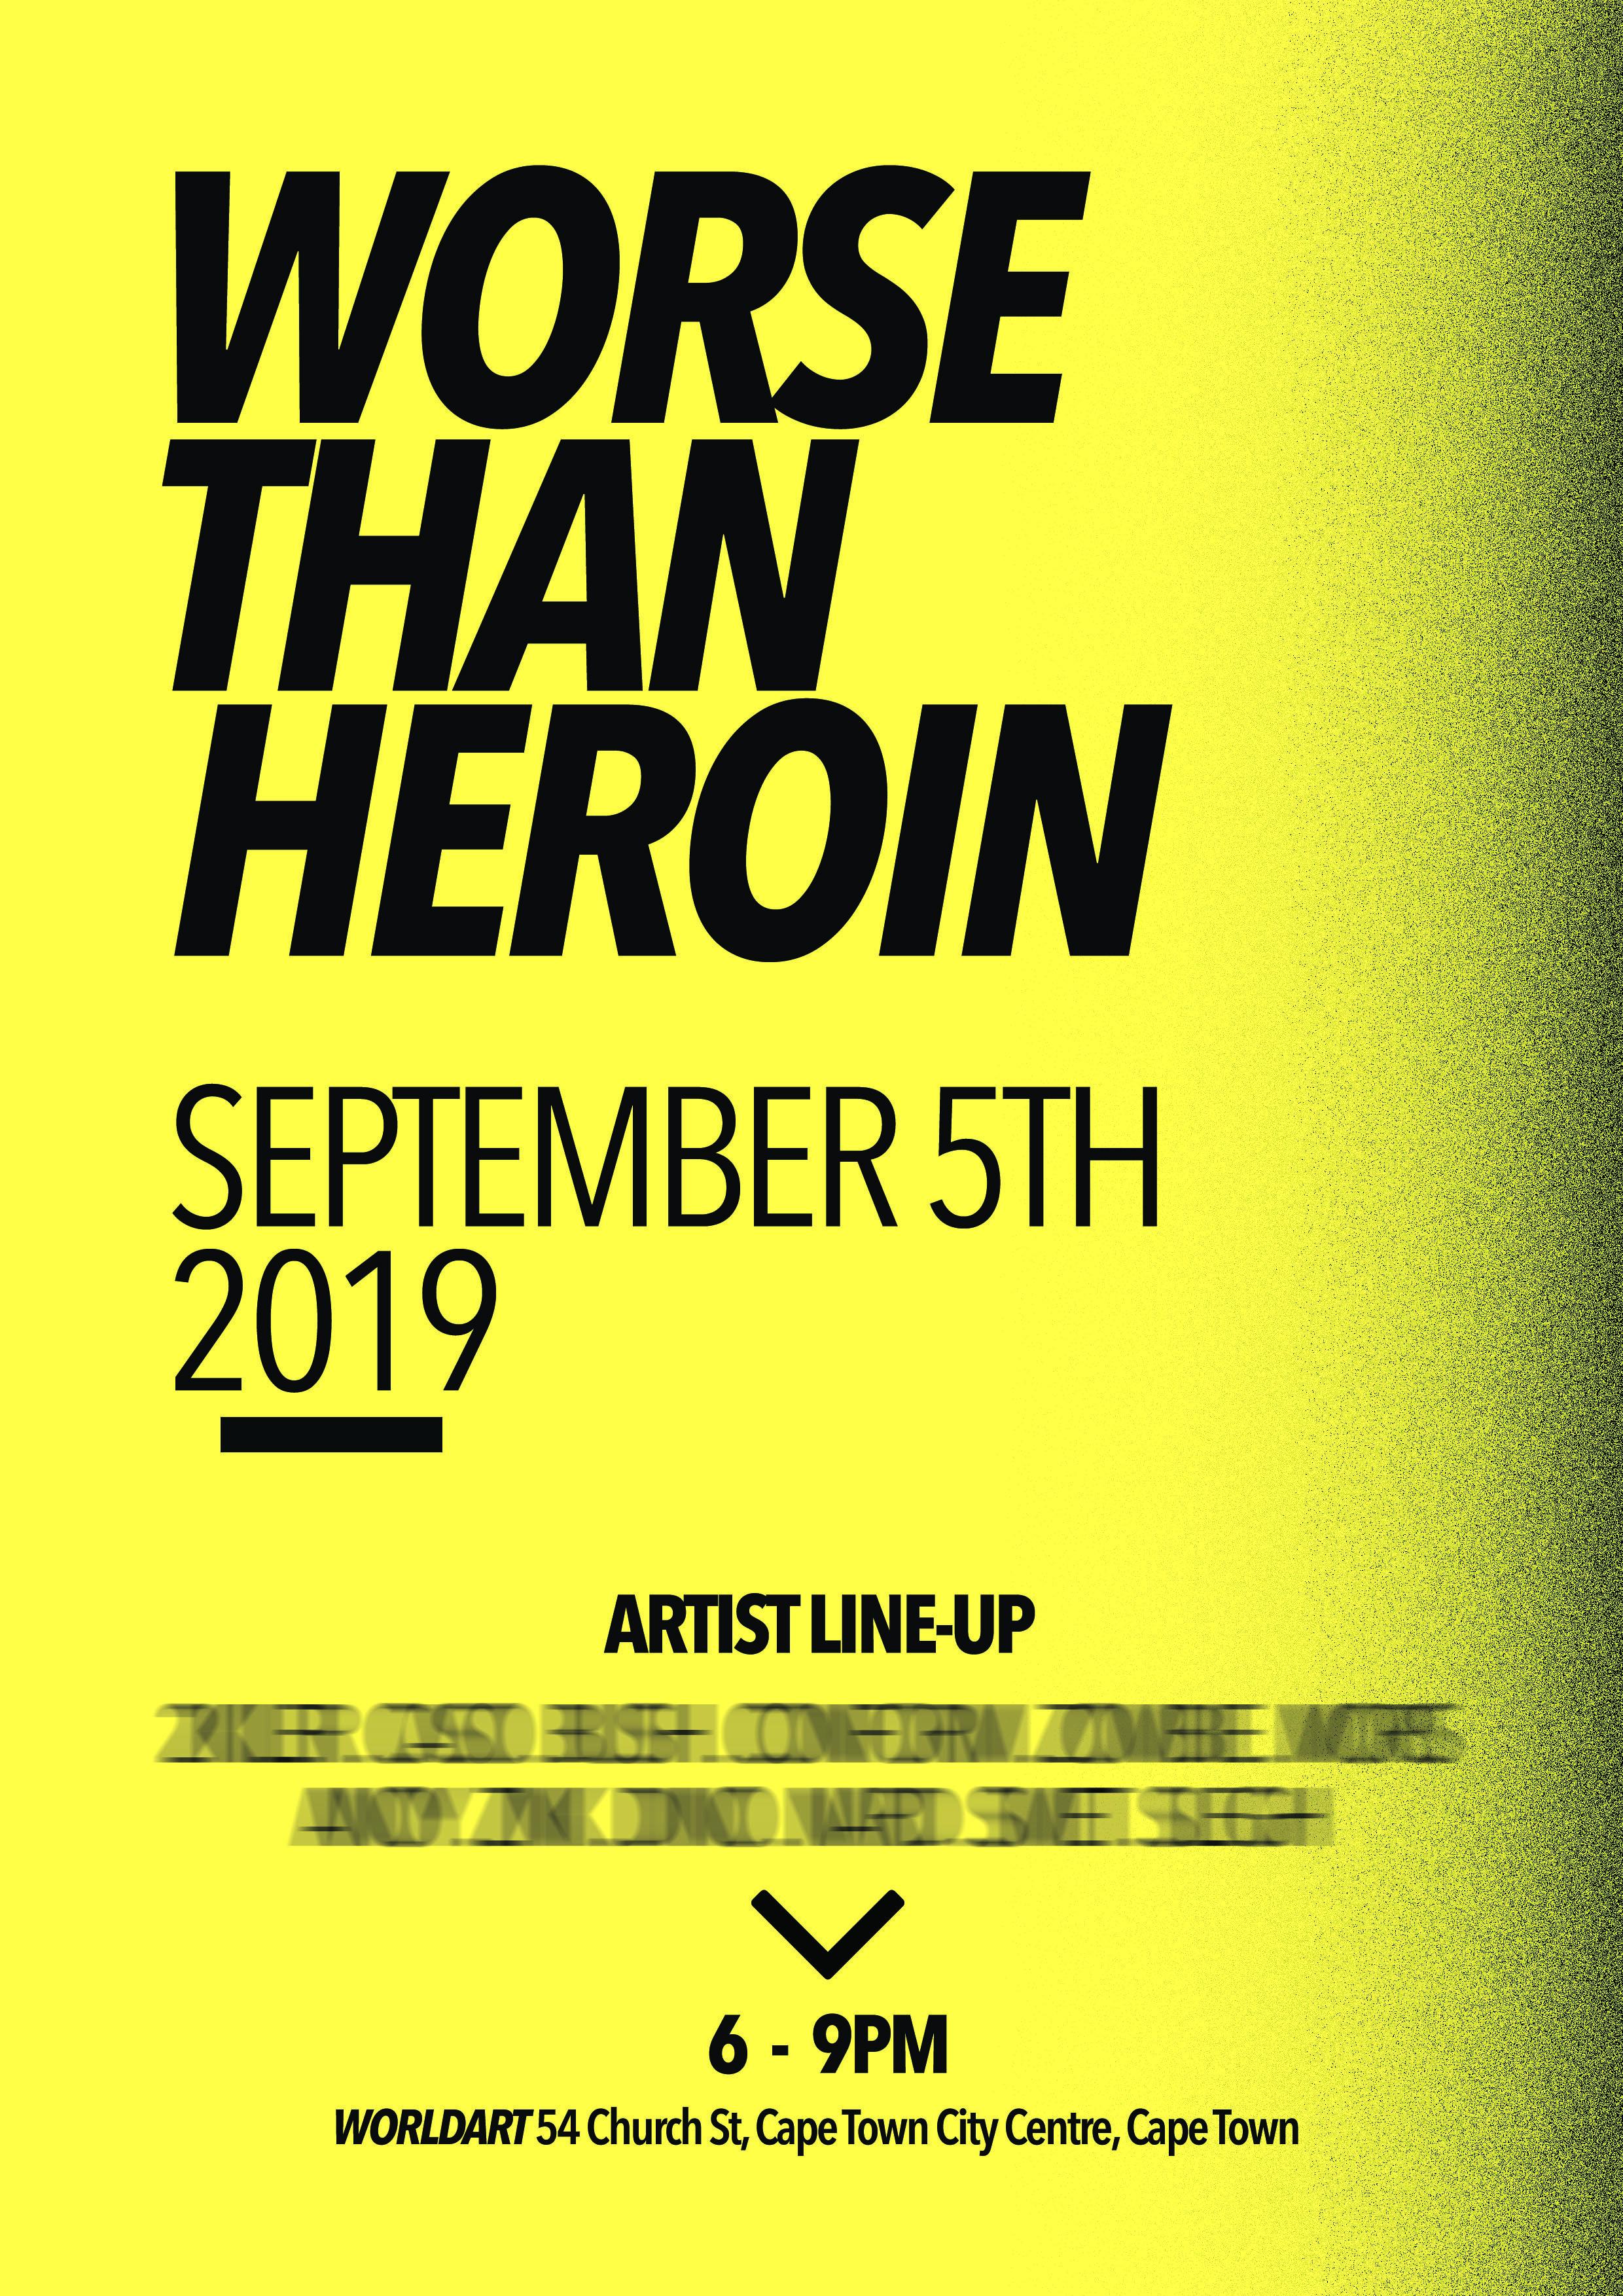 WORLDART_Worse than heroin.jpg